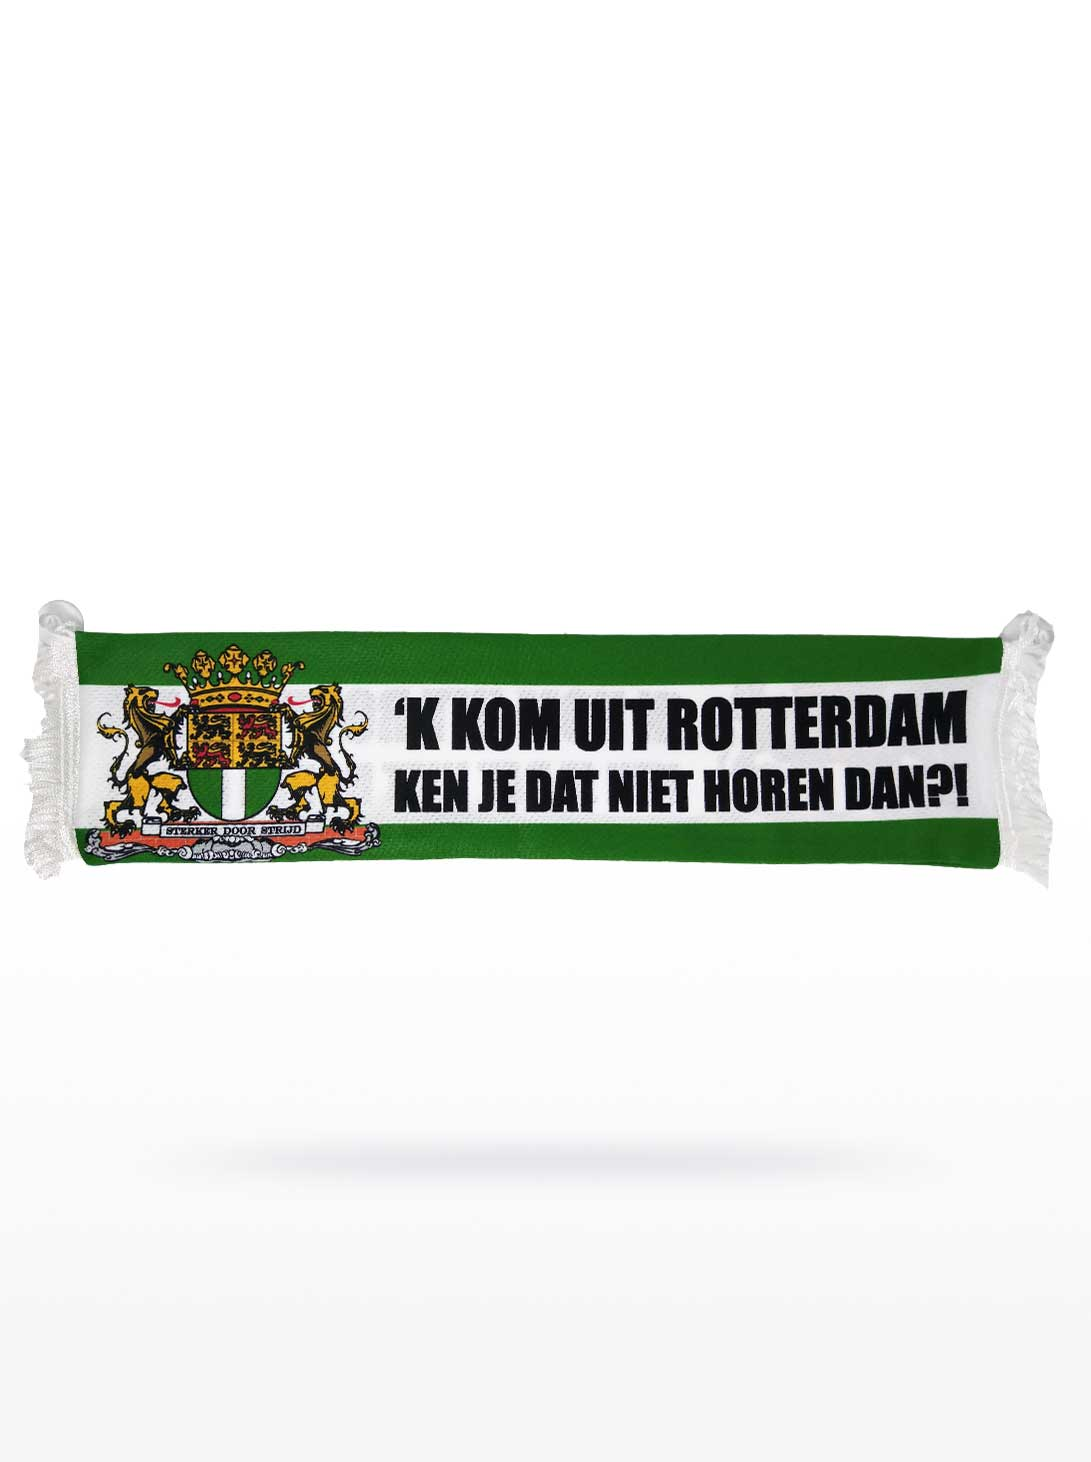 Minisjaal - 'k kom uit Rotterdam!